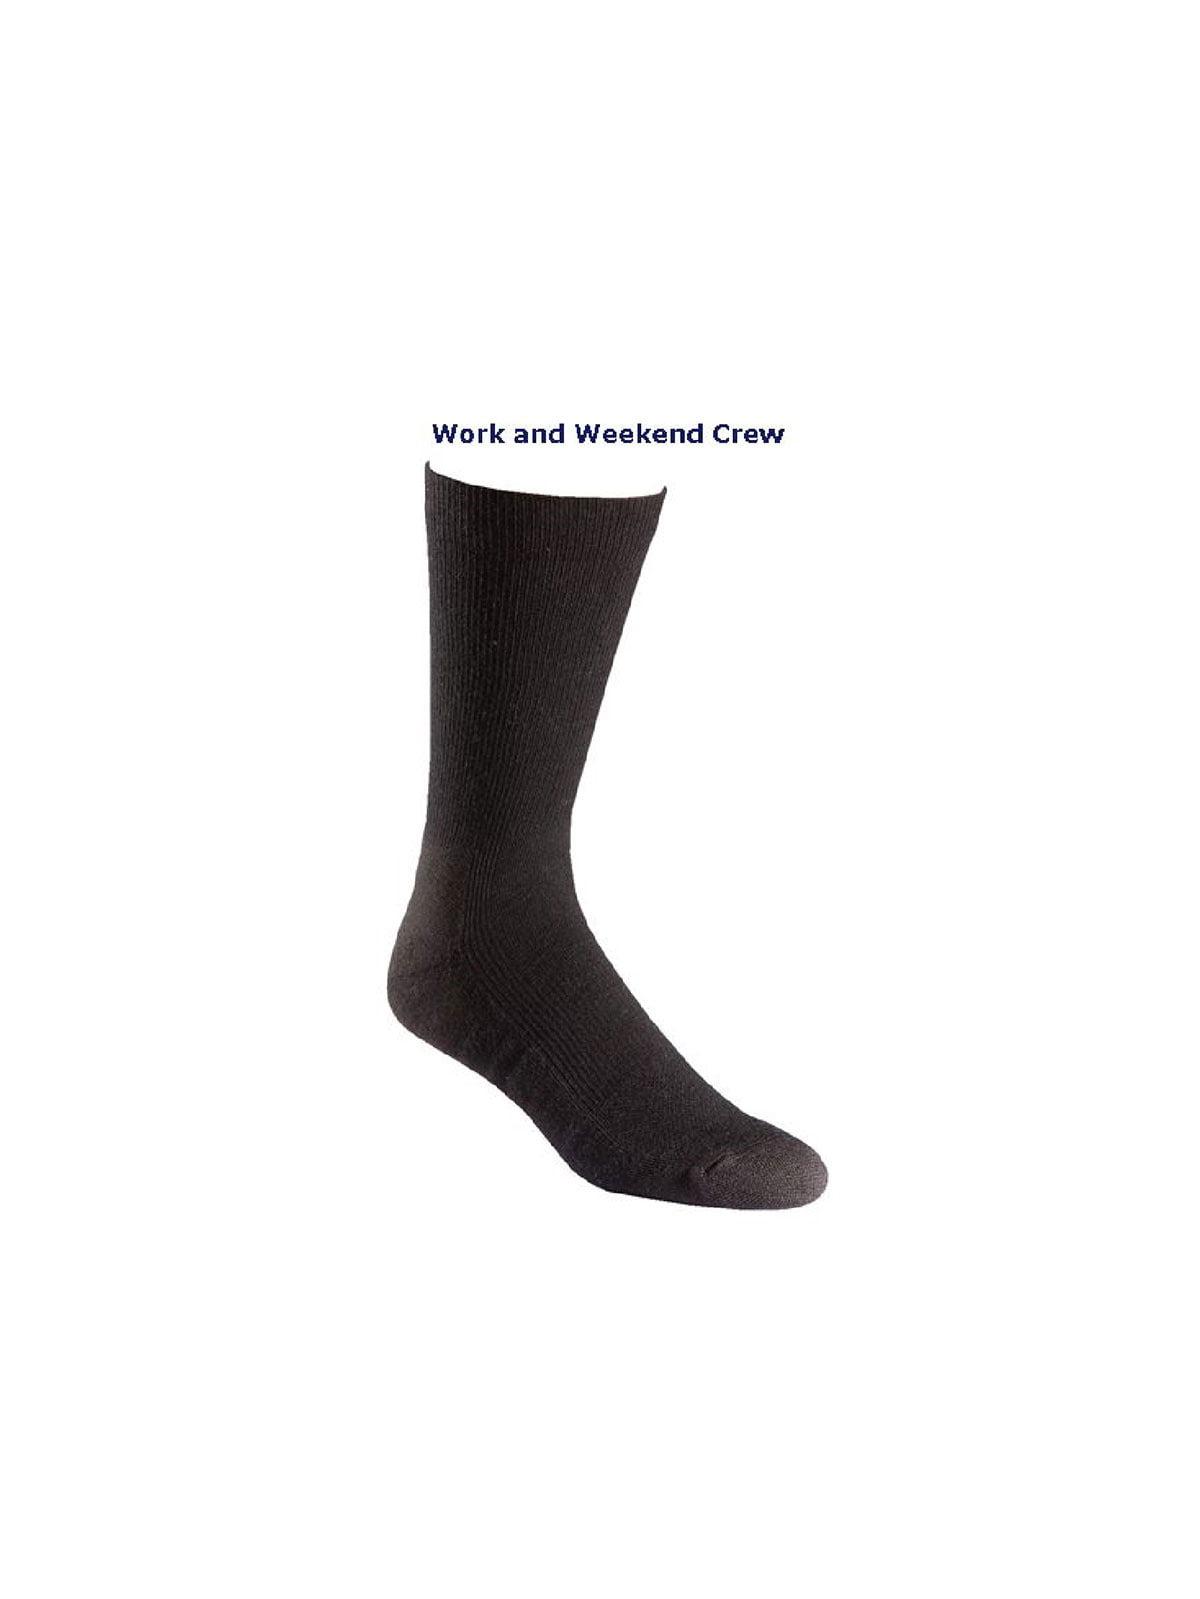 FoxRiver Work and Weekend Lightweight Moisture Wicking Crew Socks